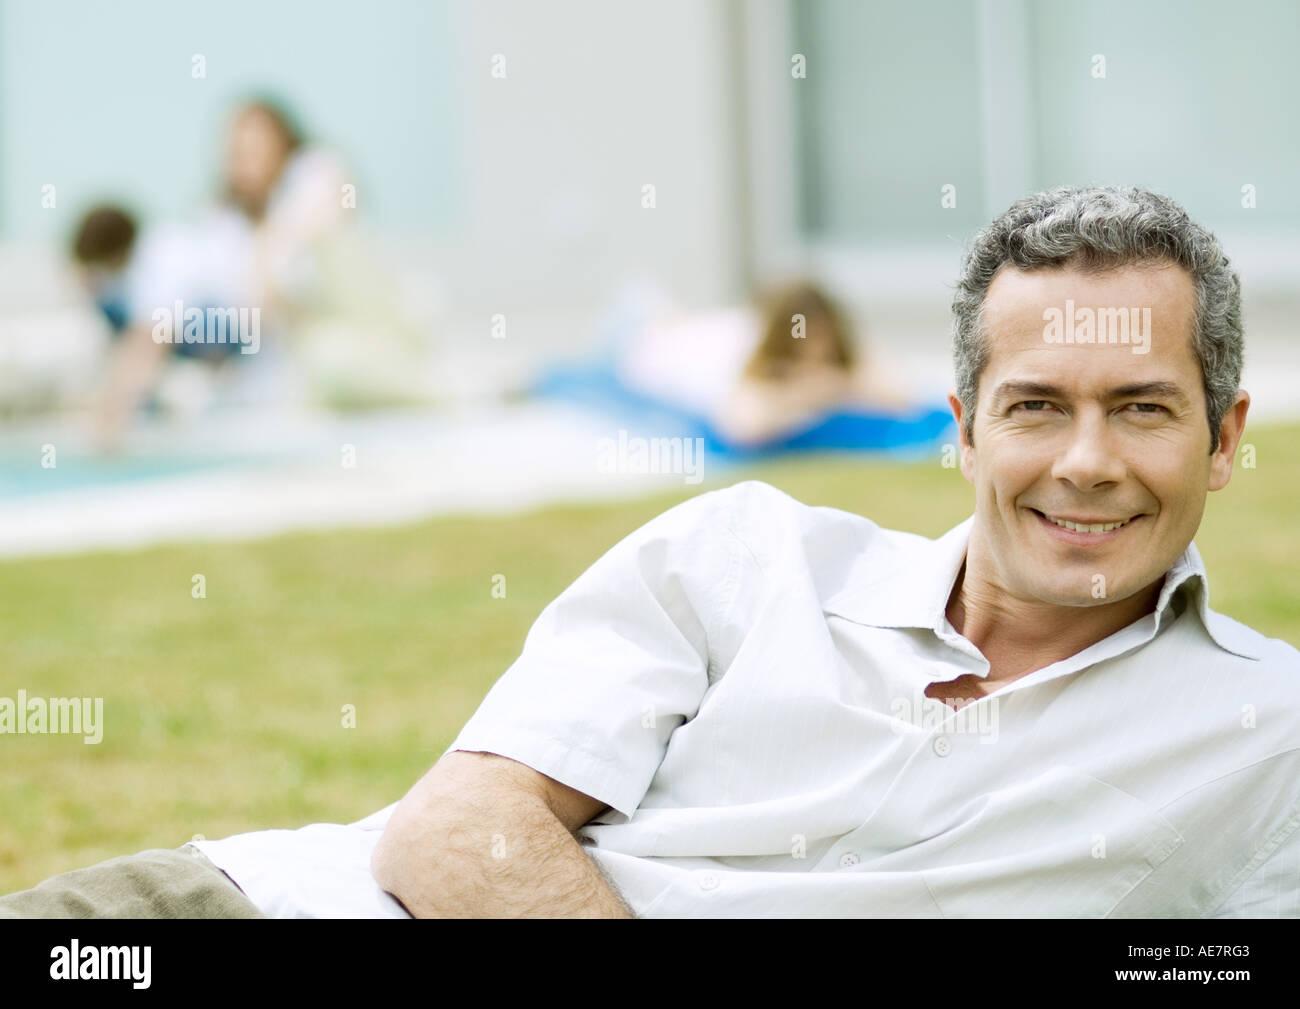 Man relaxing in yard - Stock Image